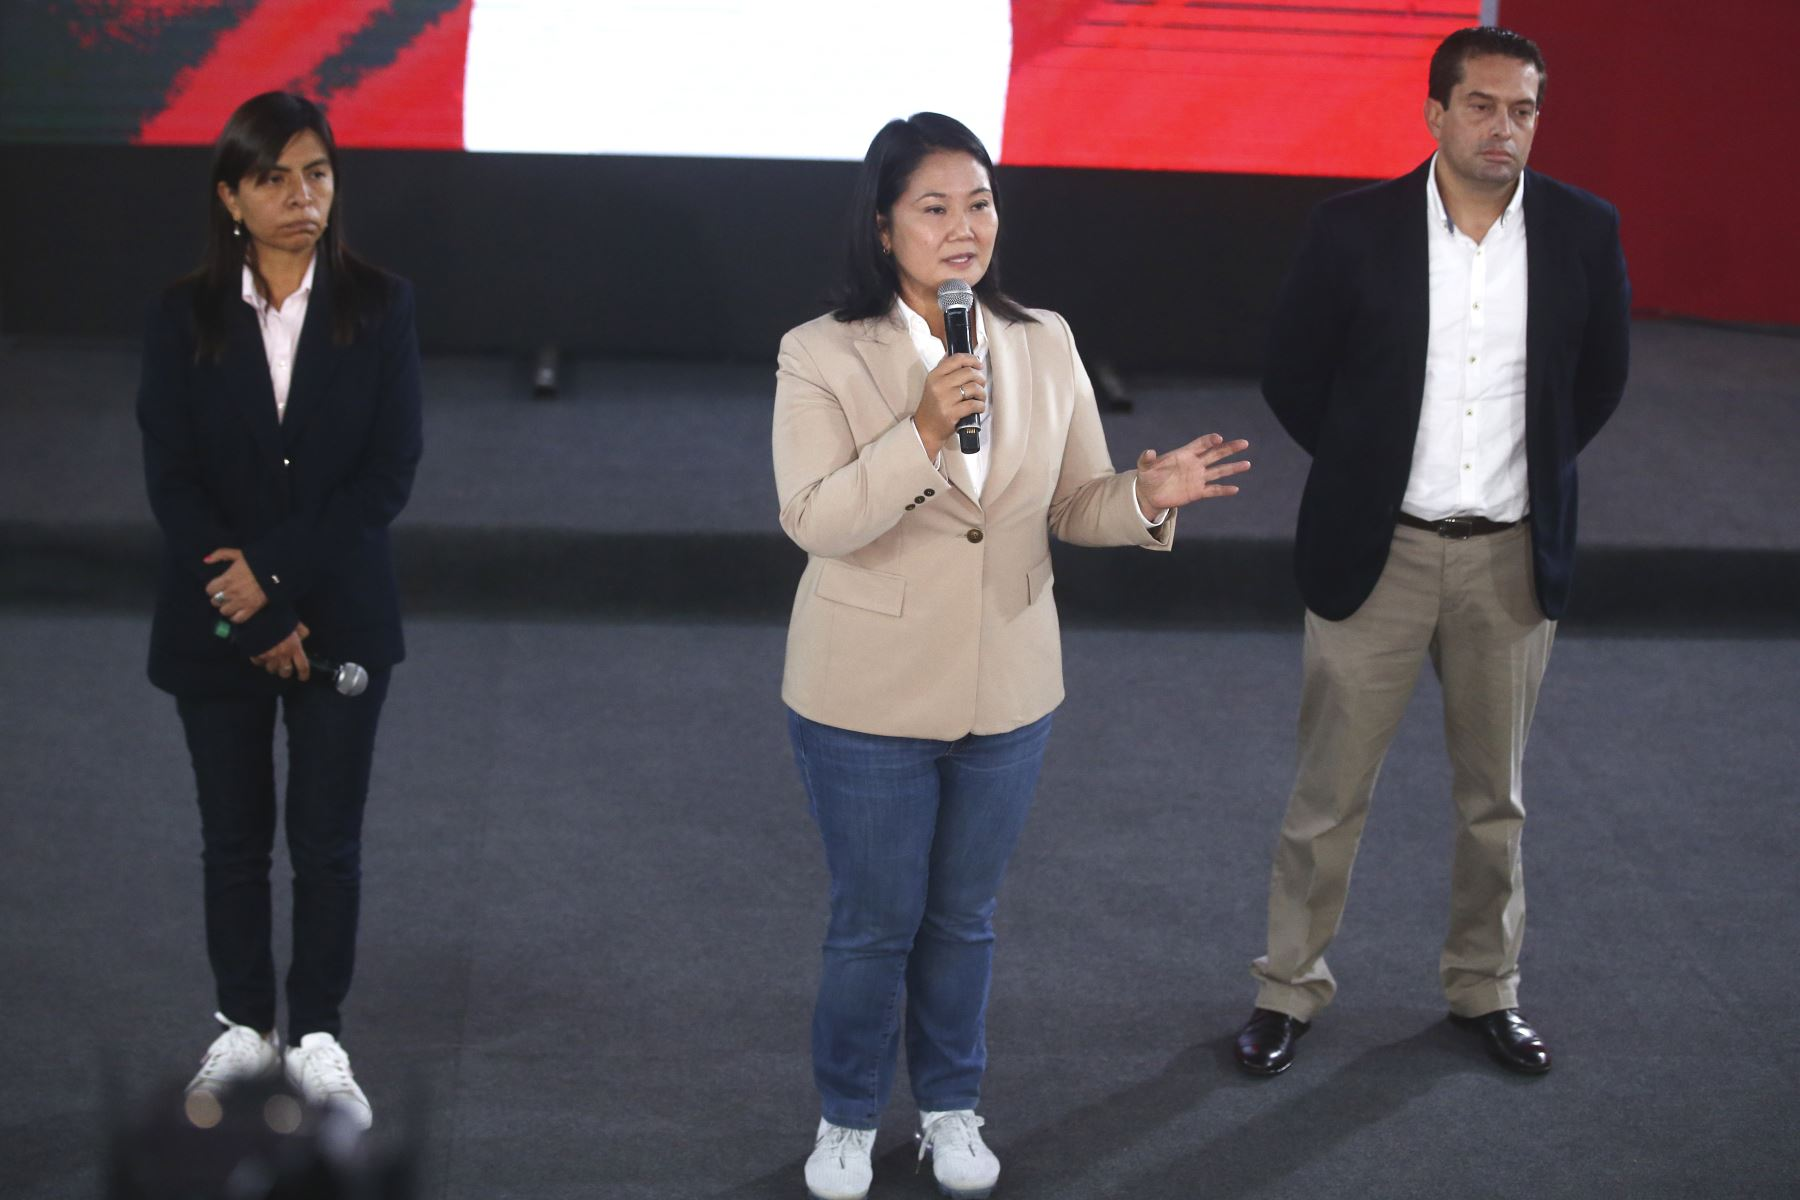 Conferencia de prensa de Keiko Fujimori junto a su abogada Giulliana Loza y Miki Torres. Foto: ANDINA/Vidal Tarqui